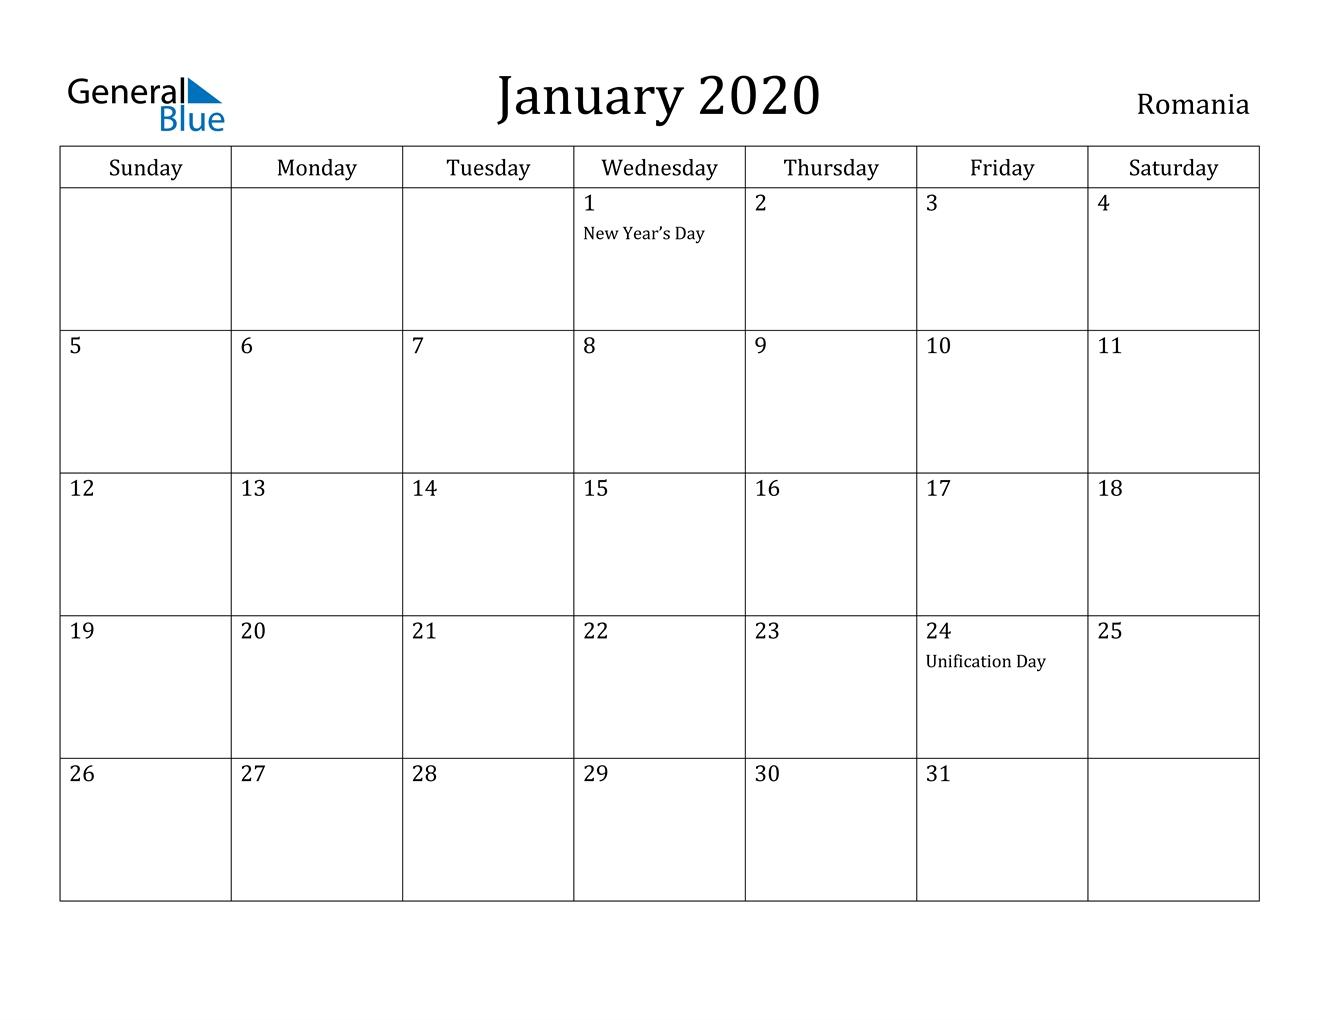 January 2020 Calendar - Romania